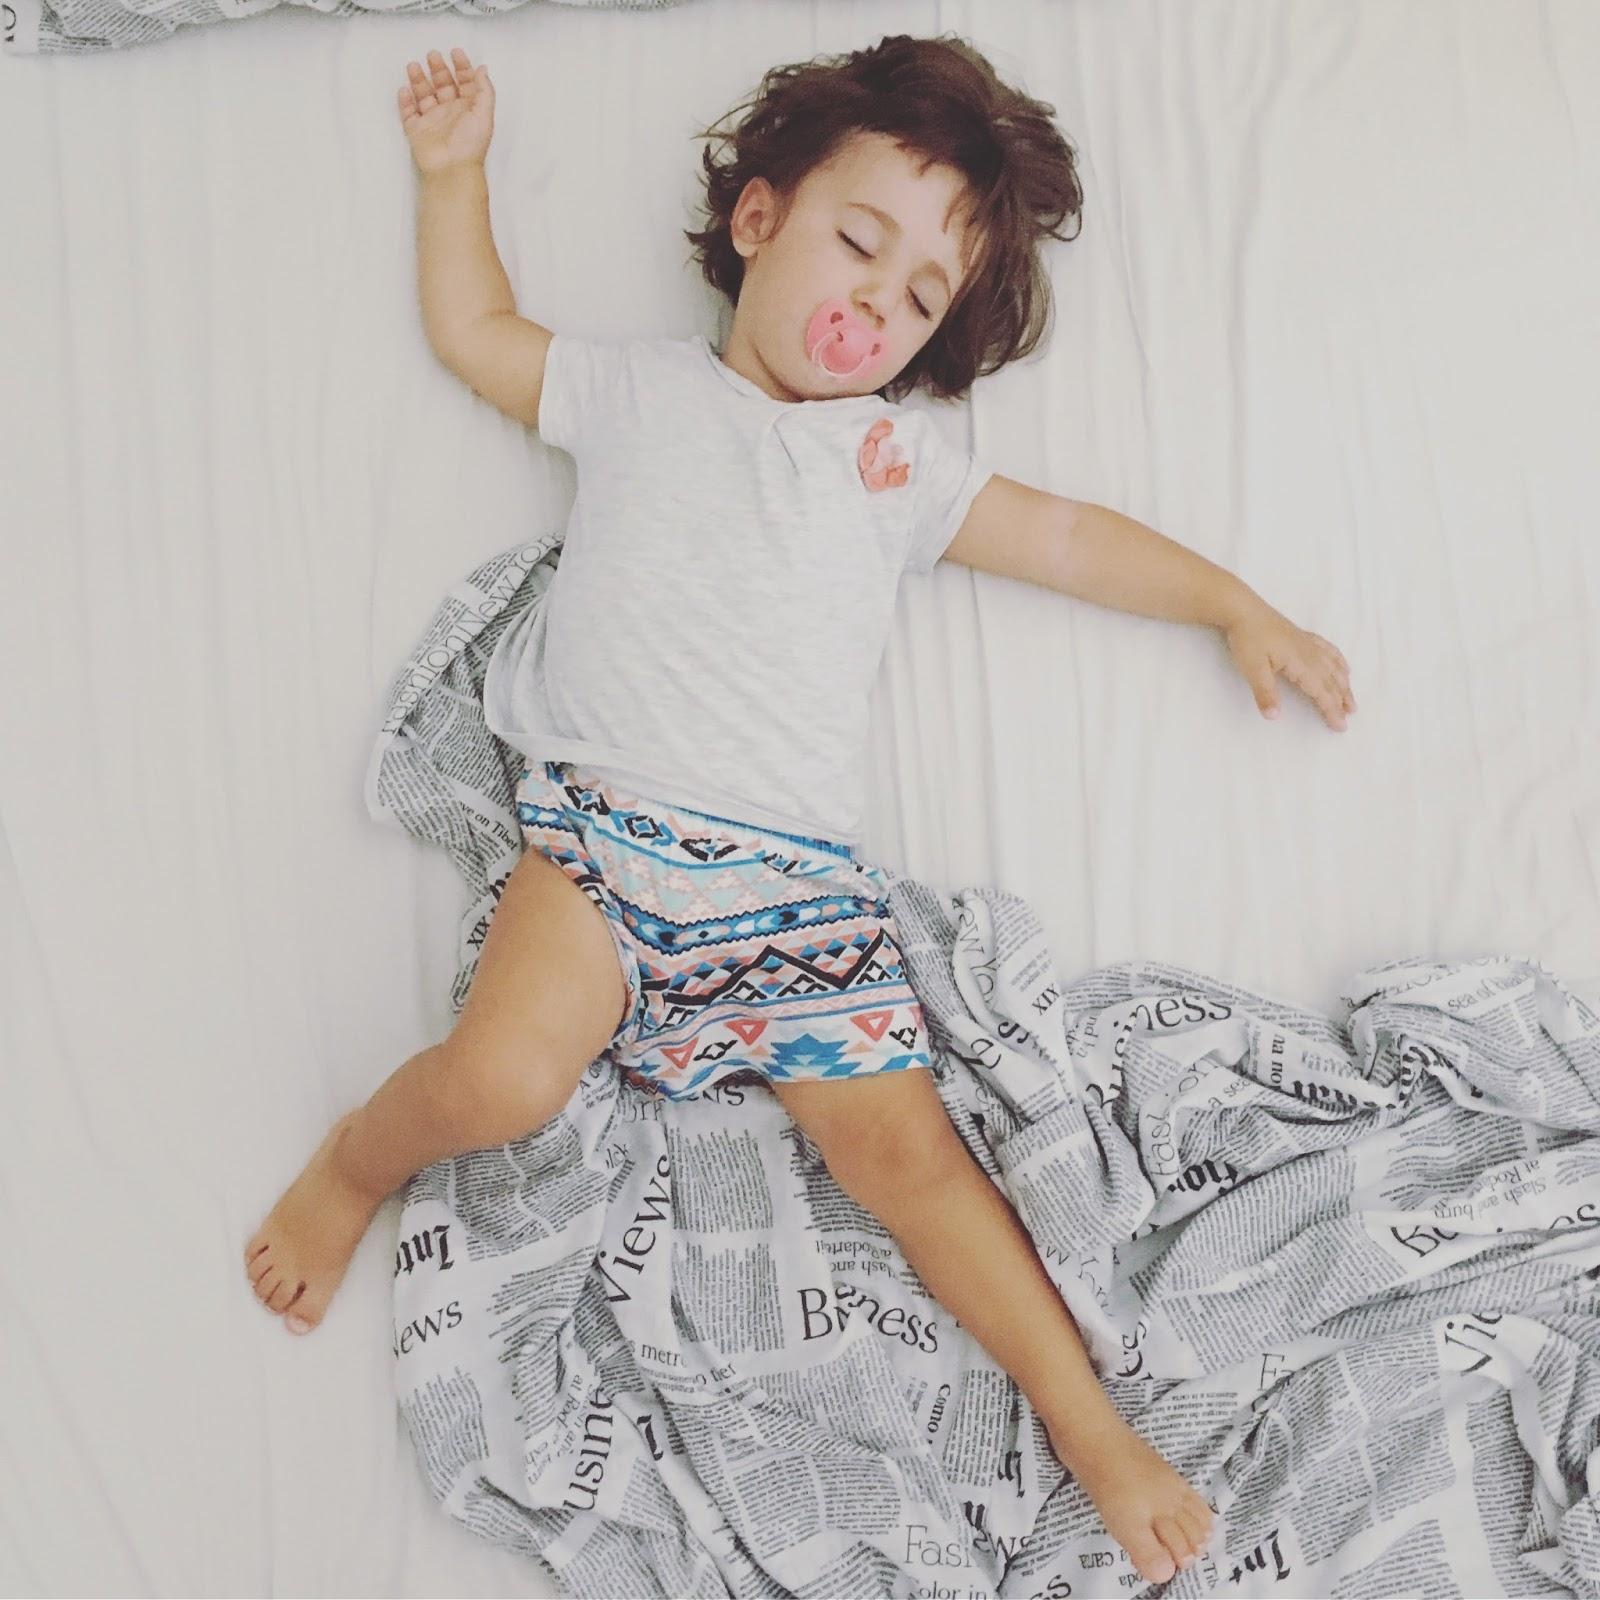 A Dormire Estivill verdeacqua: prima o poi si dorme.